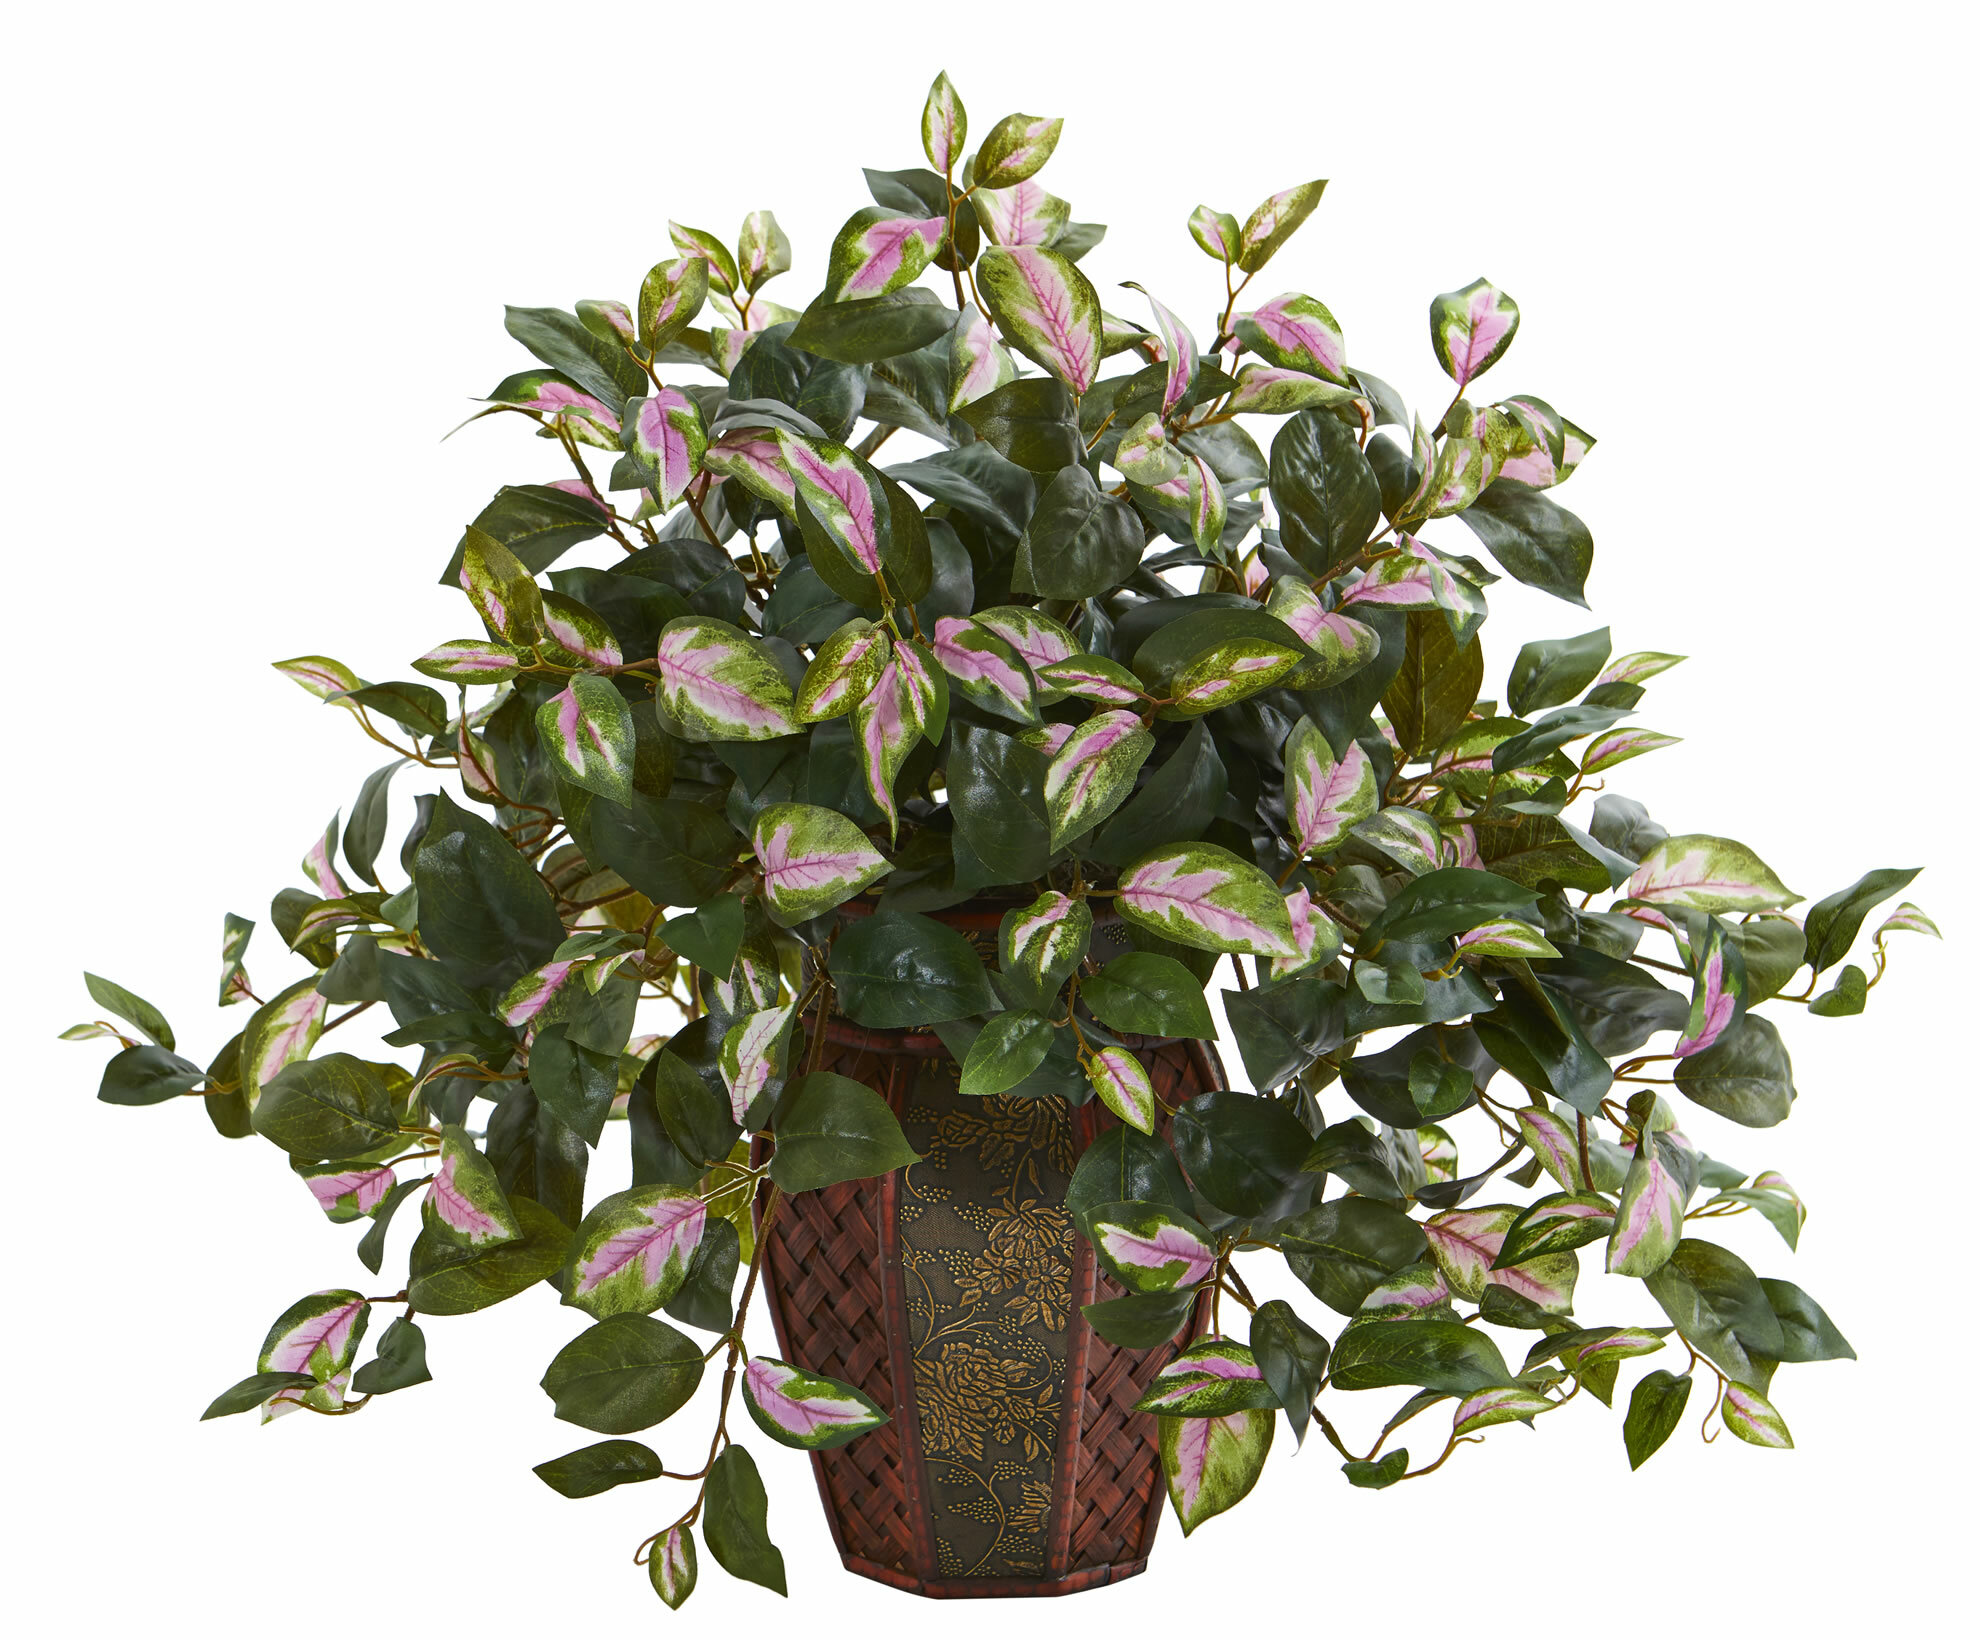 Charlton Home Artificial Hoya Plant Floral Arrangement In Planter